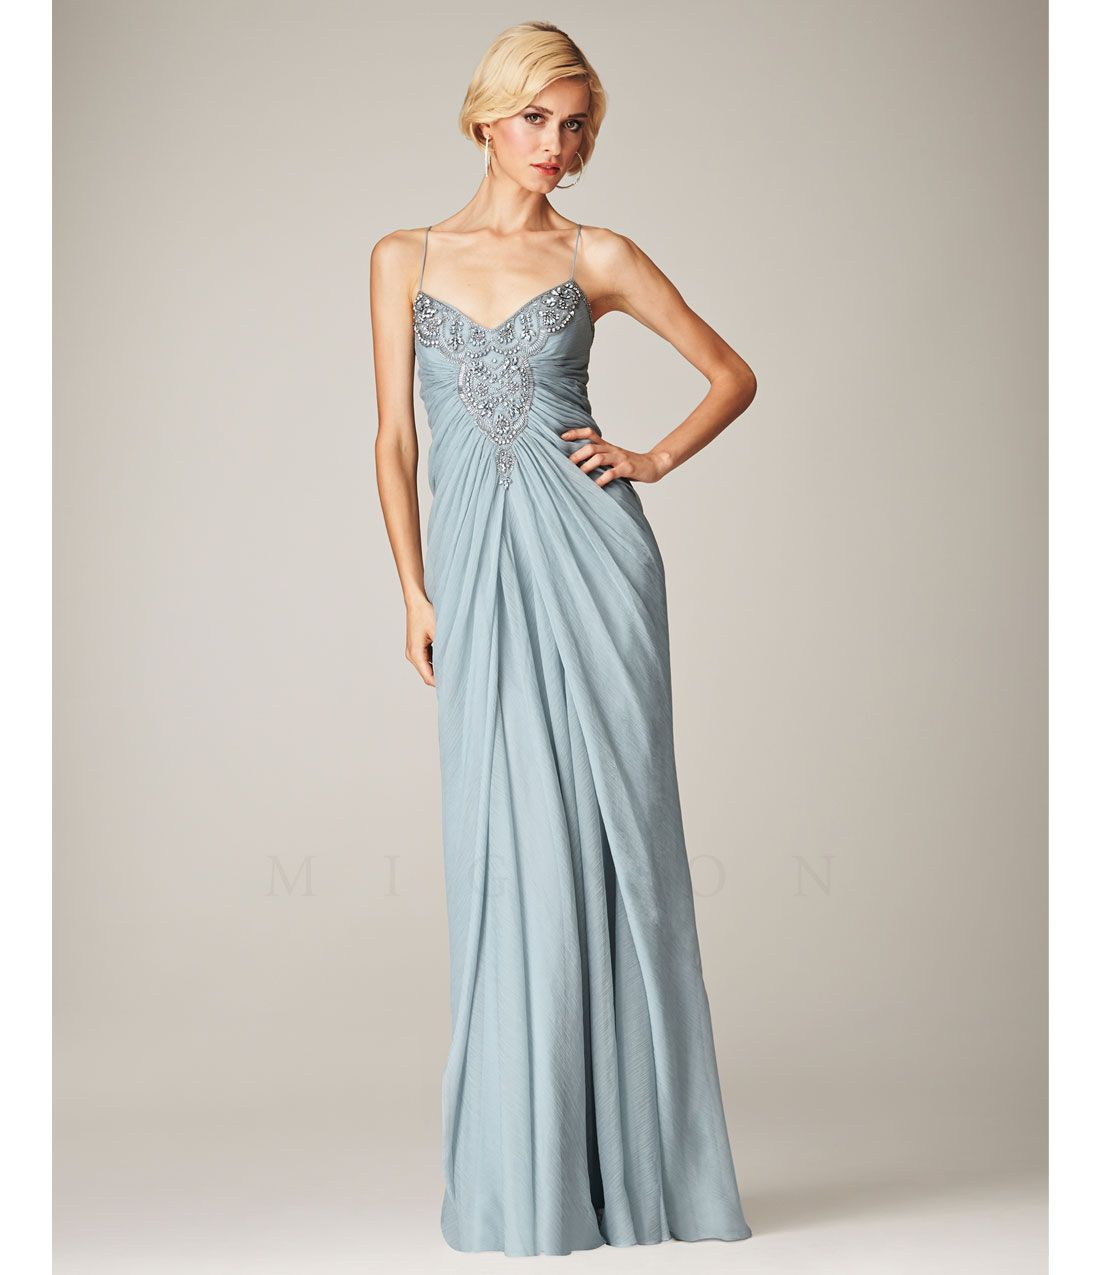 Unique Elie Saab Wedding Dresses Composition - All Wedding Dresses ...